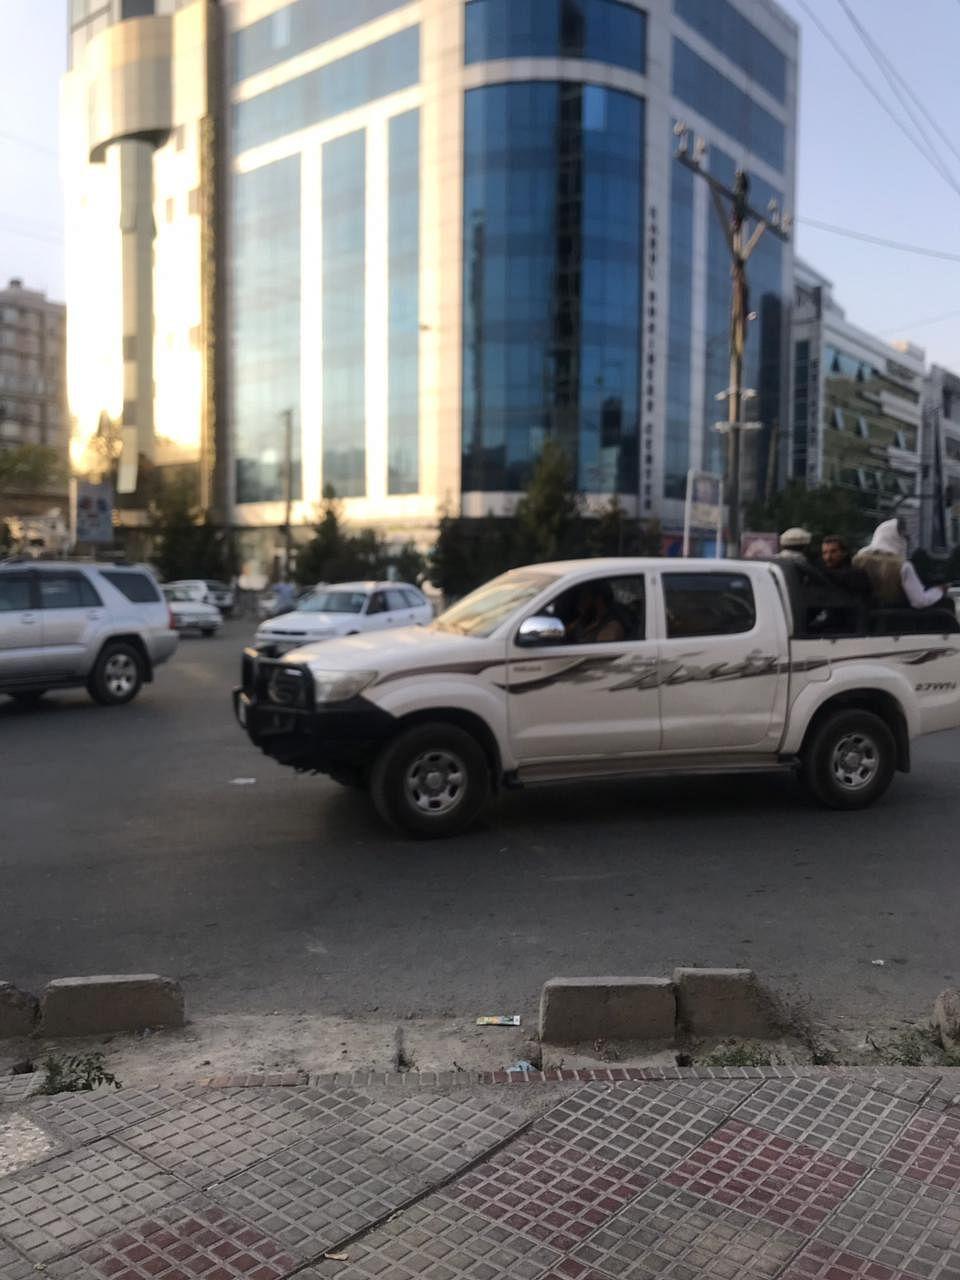 Taliban patrolling the streets of Kabul